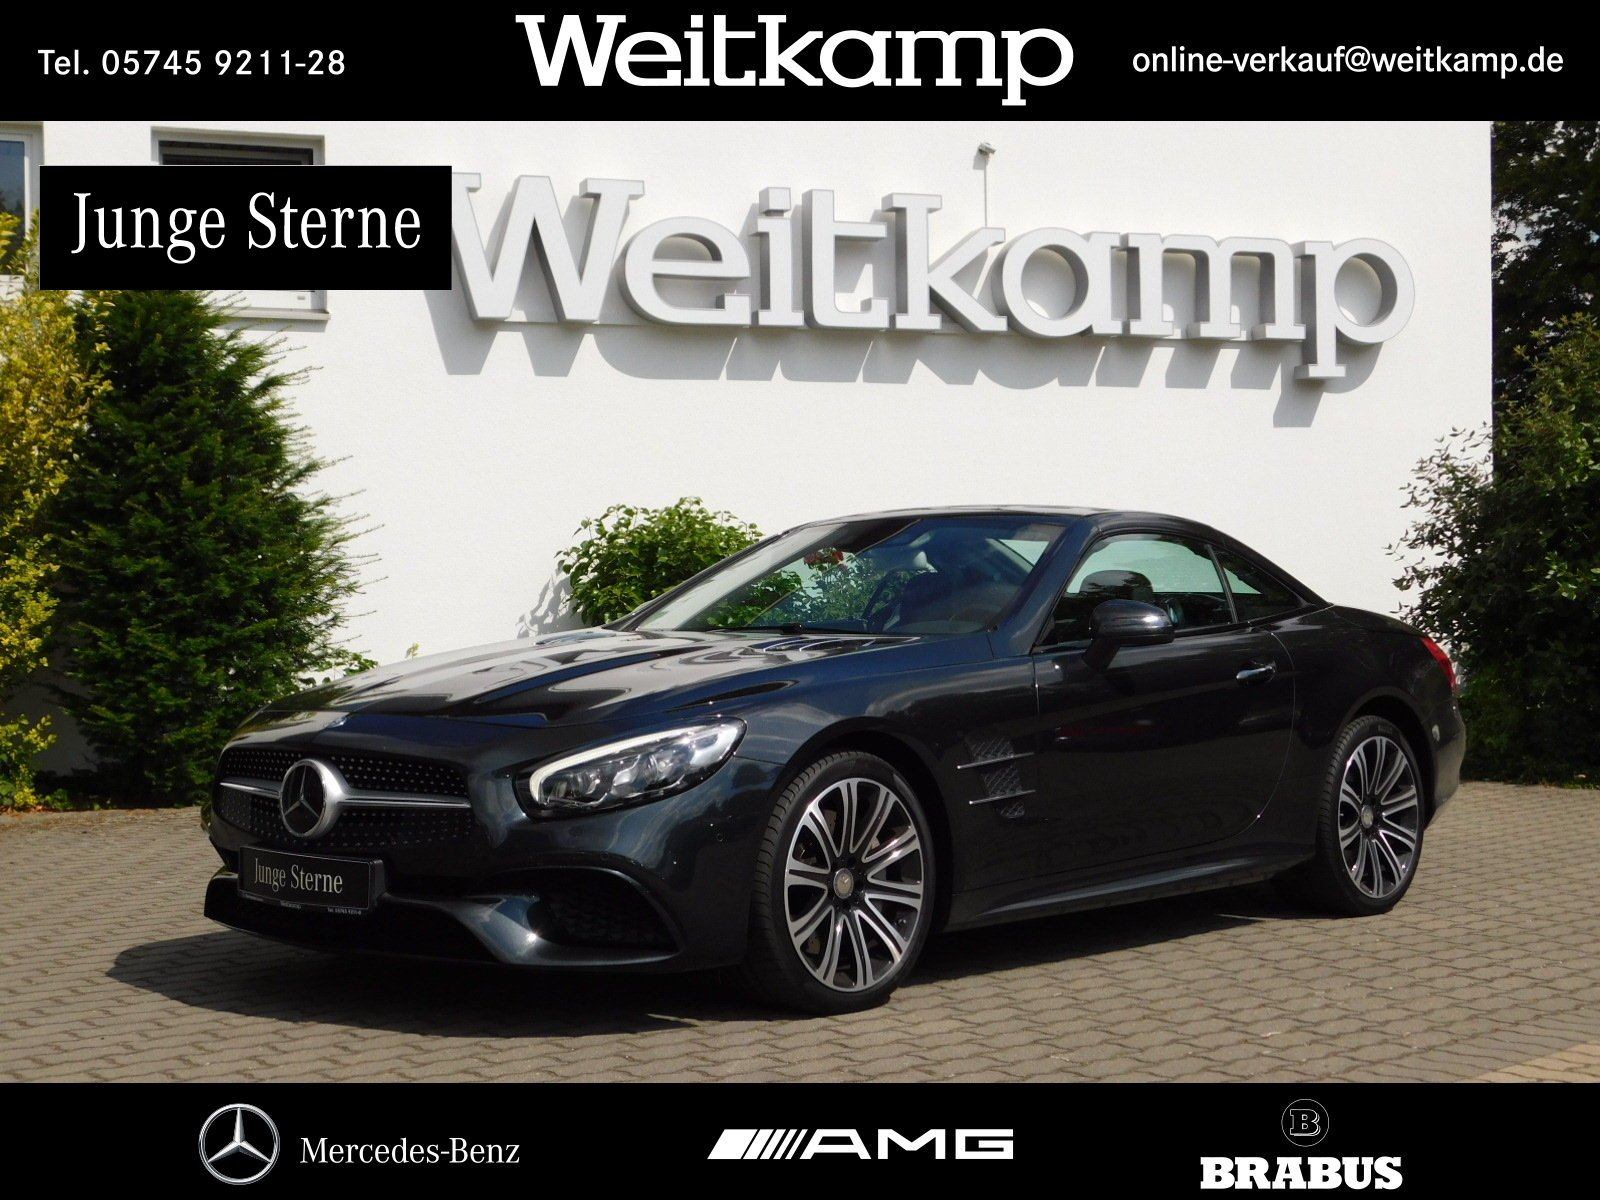 Mercedes-Benz SL 500 AMG+Pano+Distr.+H&K+Airscarf+Keyless+Kam., Jahr 2015, petrol